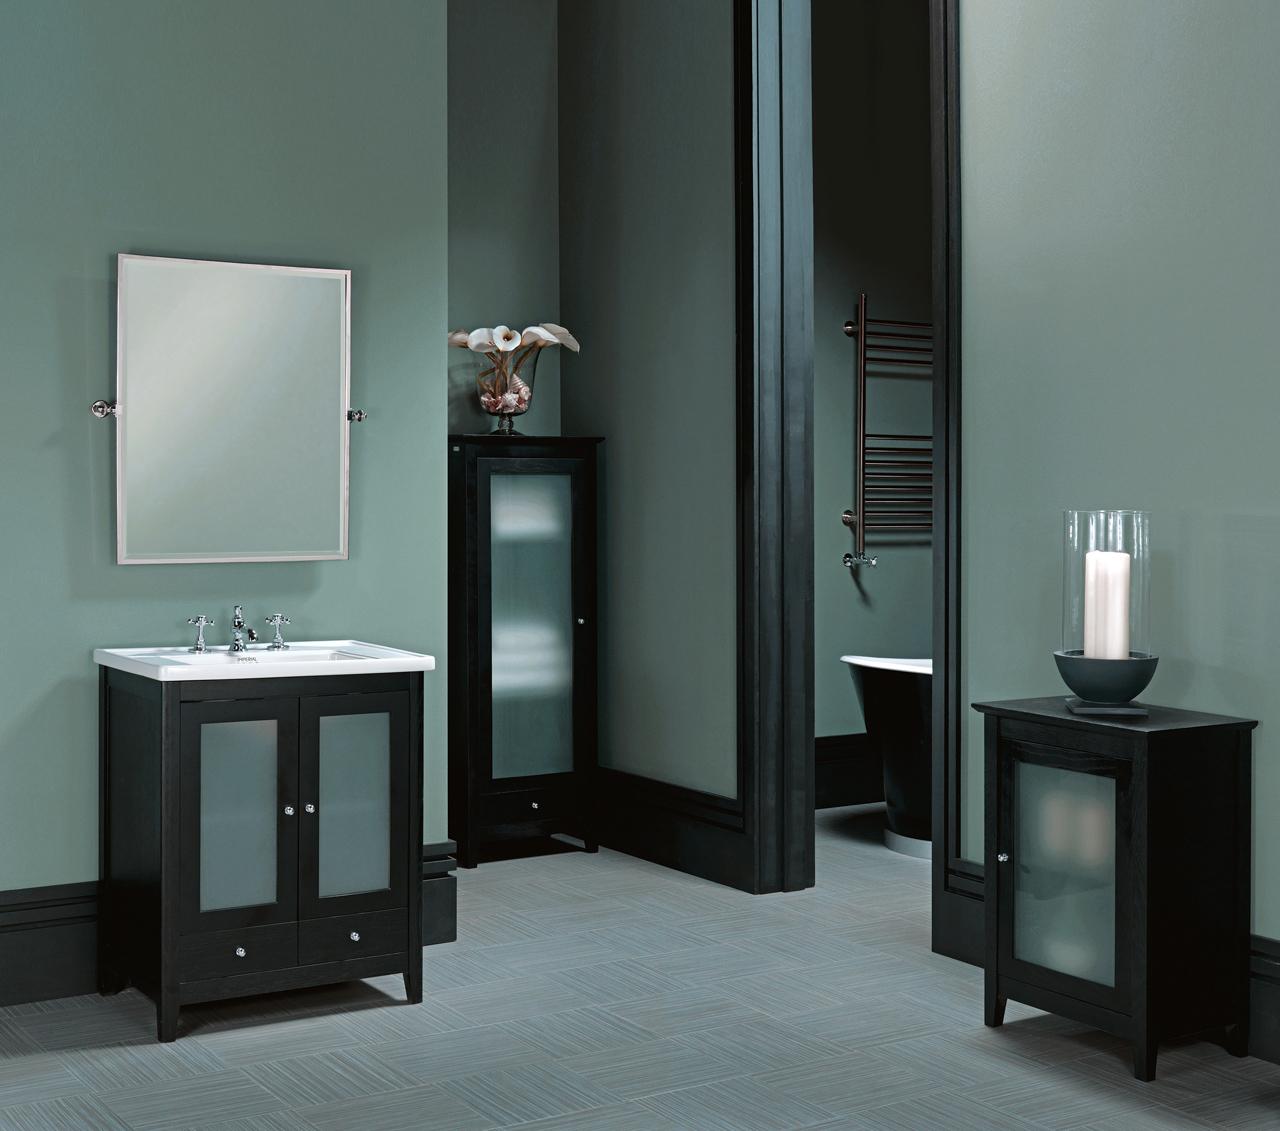 Classic Bathrooms: Imperial Bathrooms - Retouch